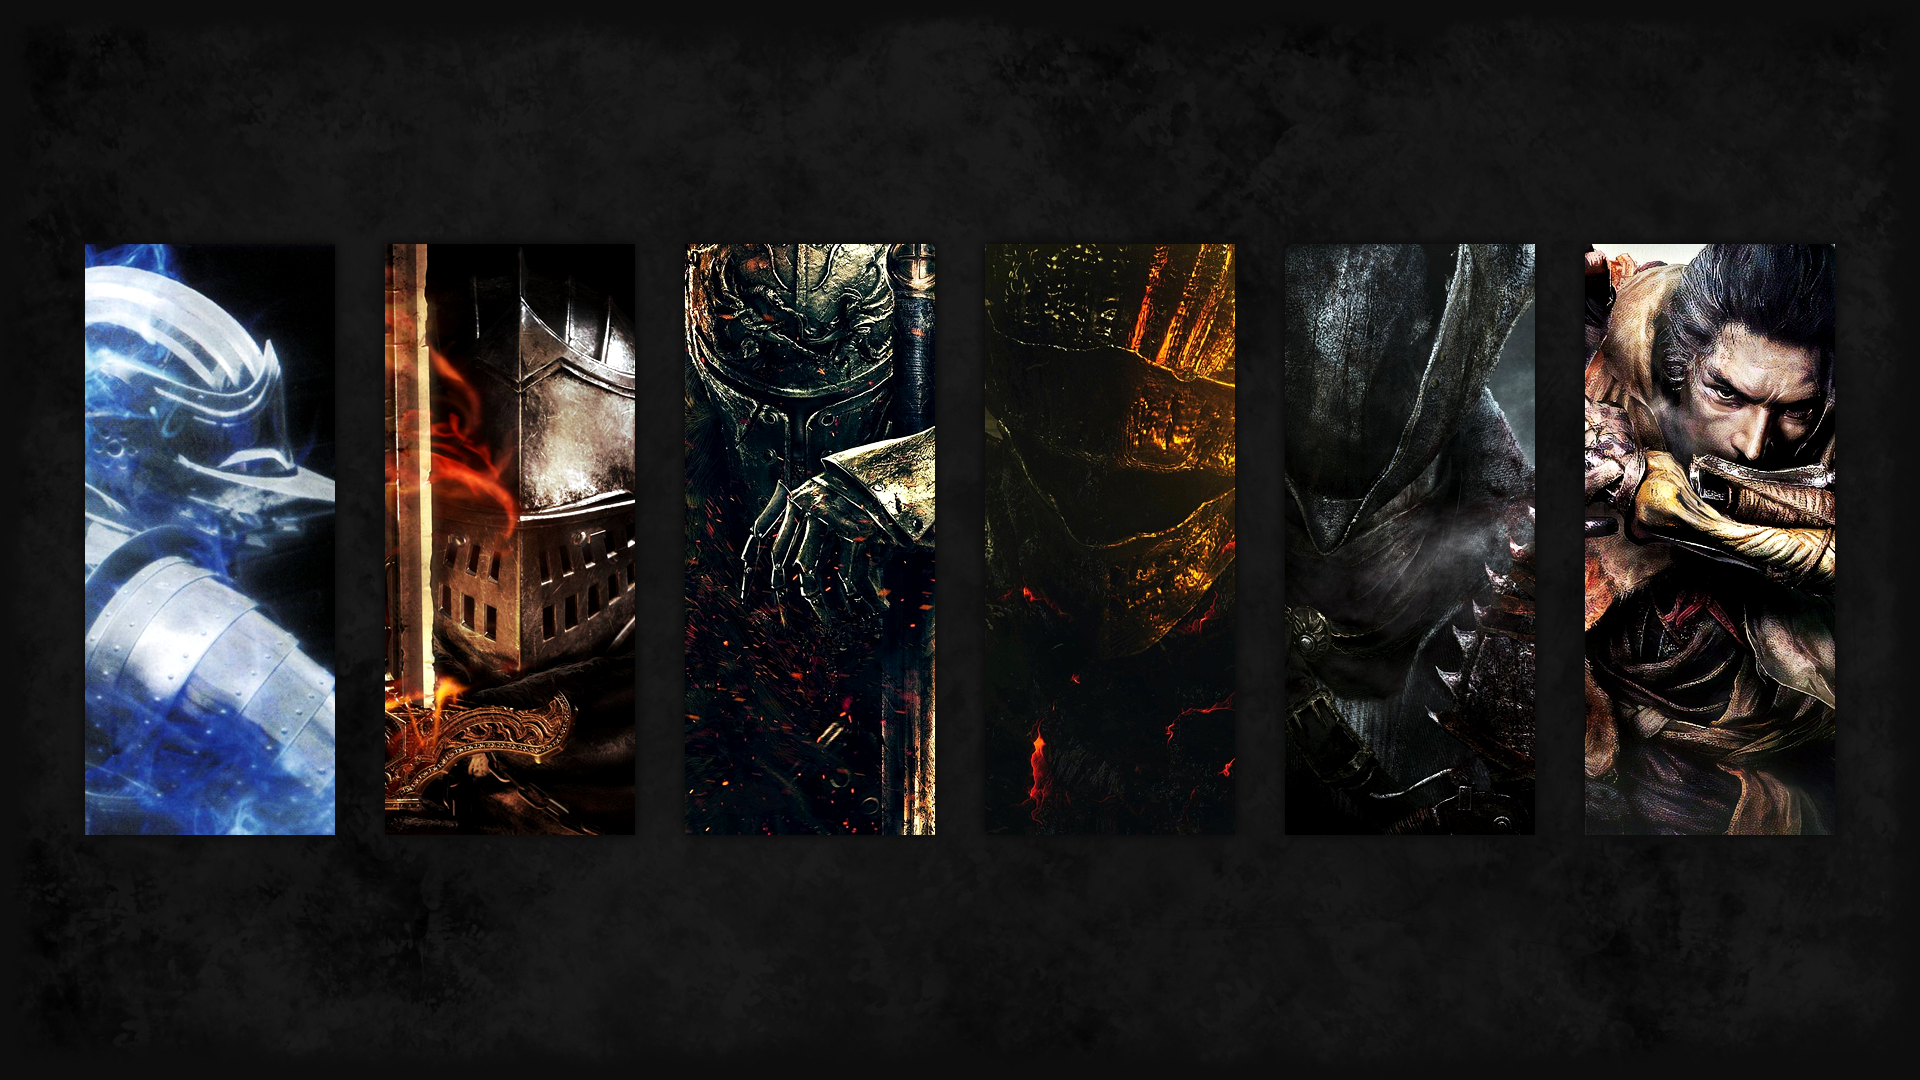 General 1920x1080 Dark Souls Dark Souls II dark souls 3 Bloodborne Sekiro: Shadows Die Twice video games Demon's Souls